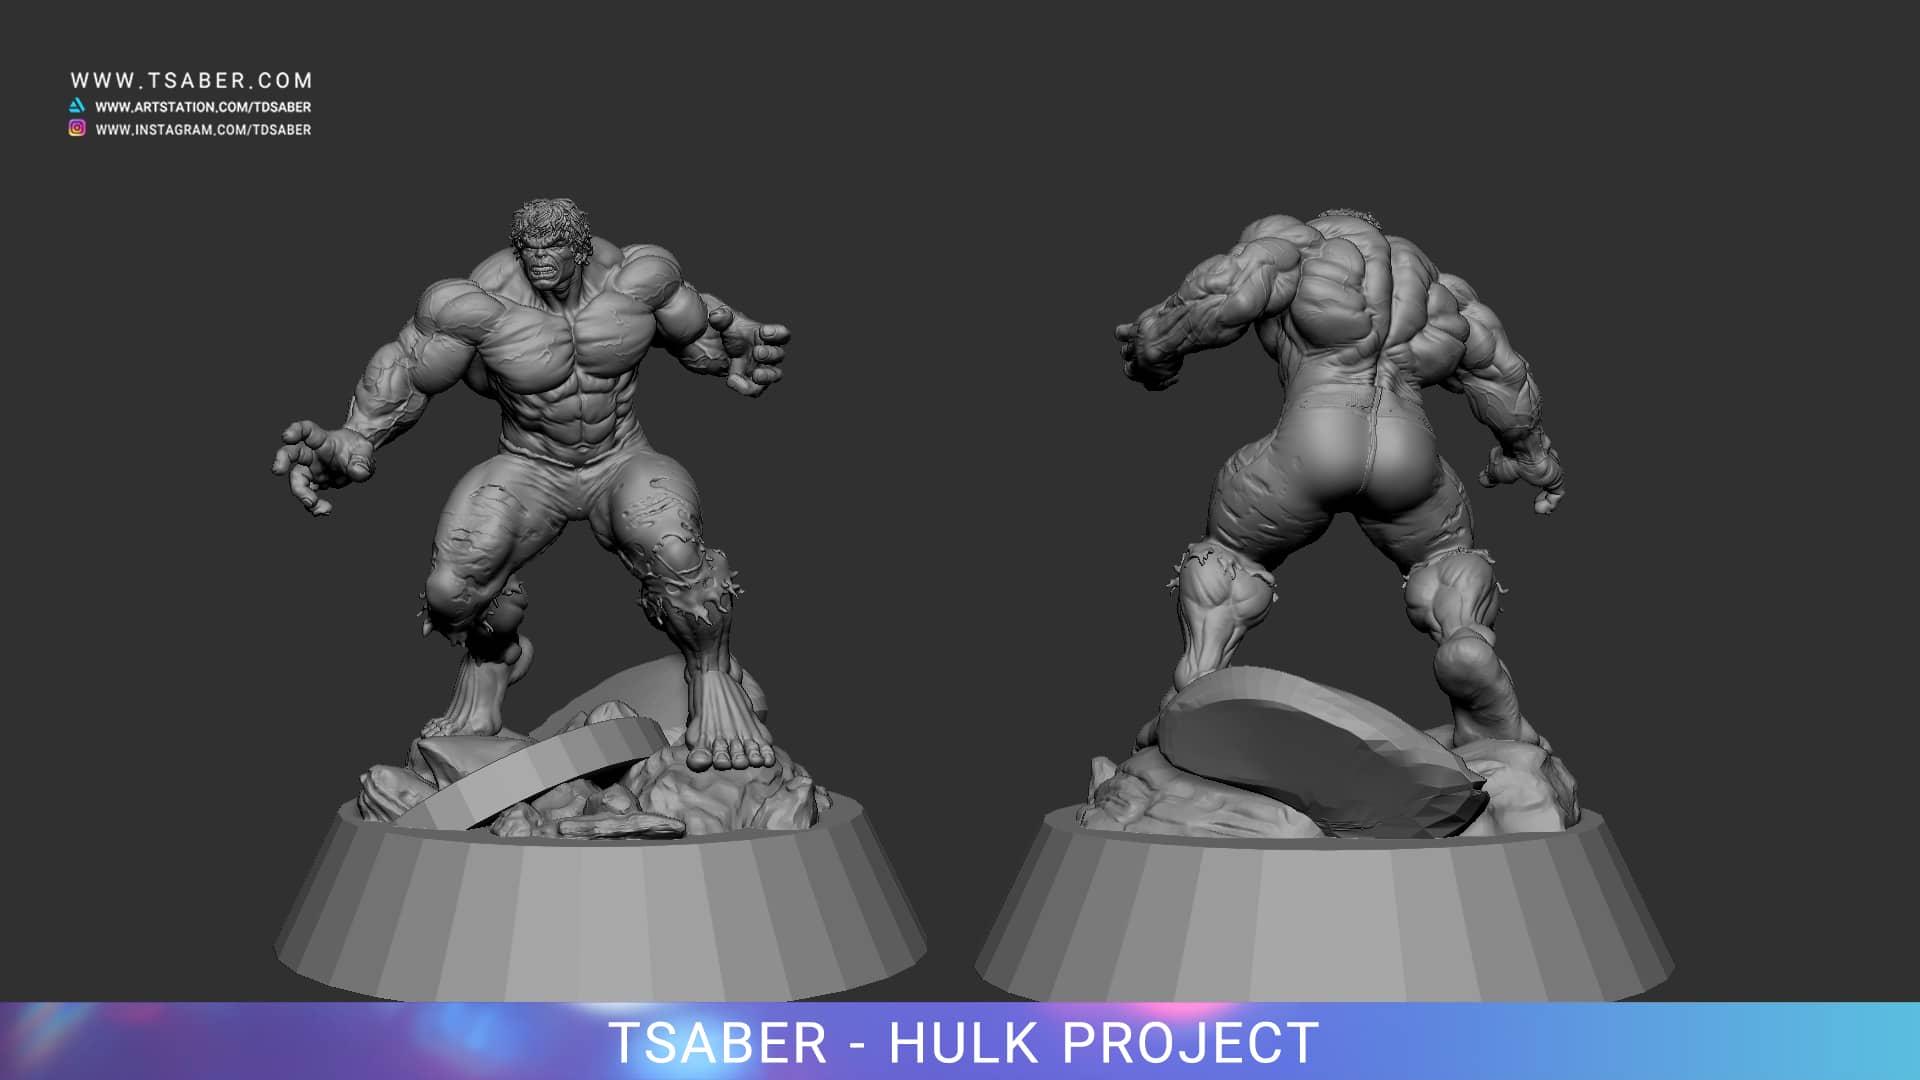 Making of 80's Incredible Hulk Statue - Zbrush 3D Modelling - Tsaber